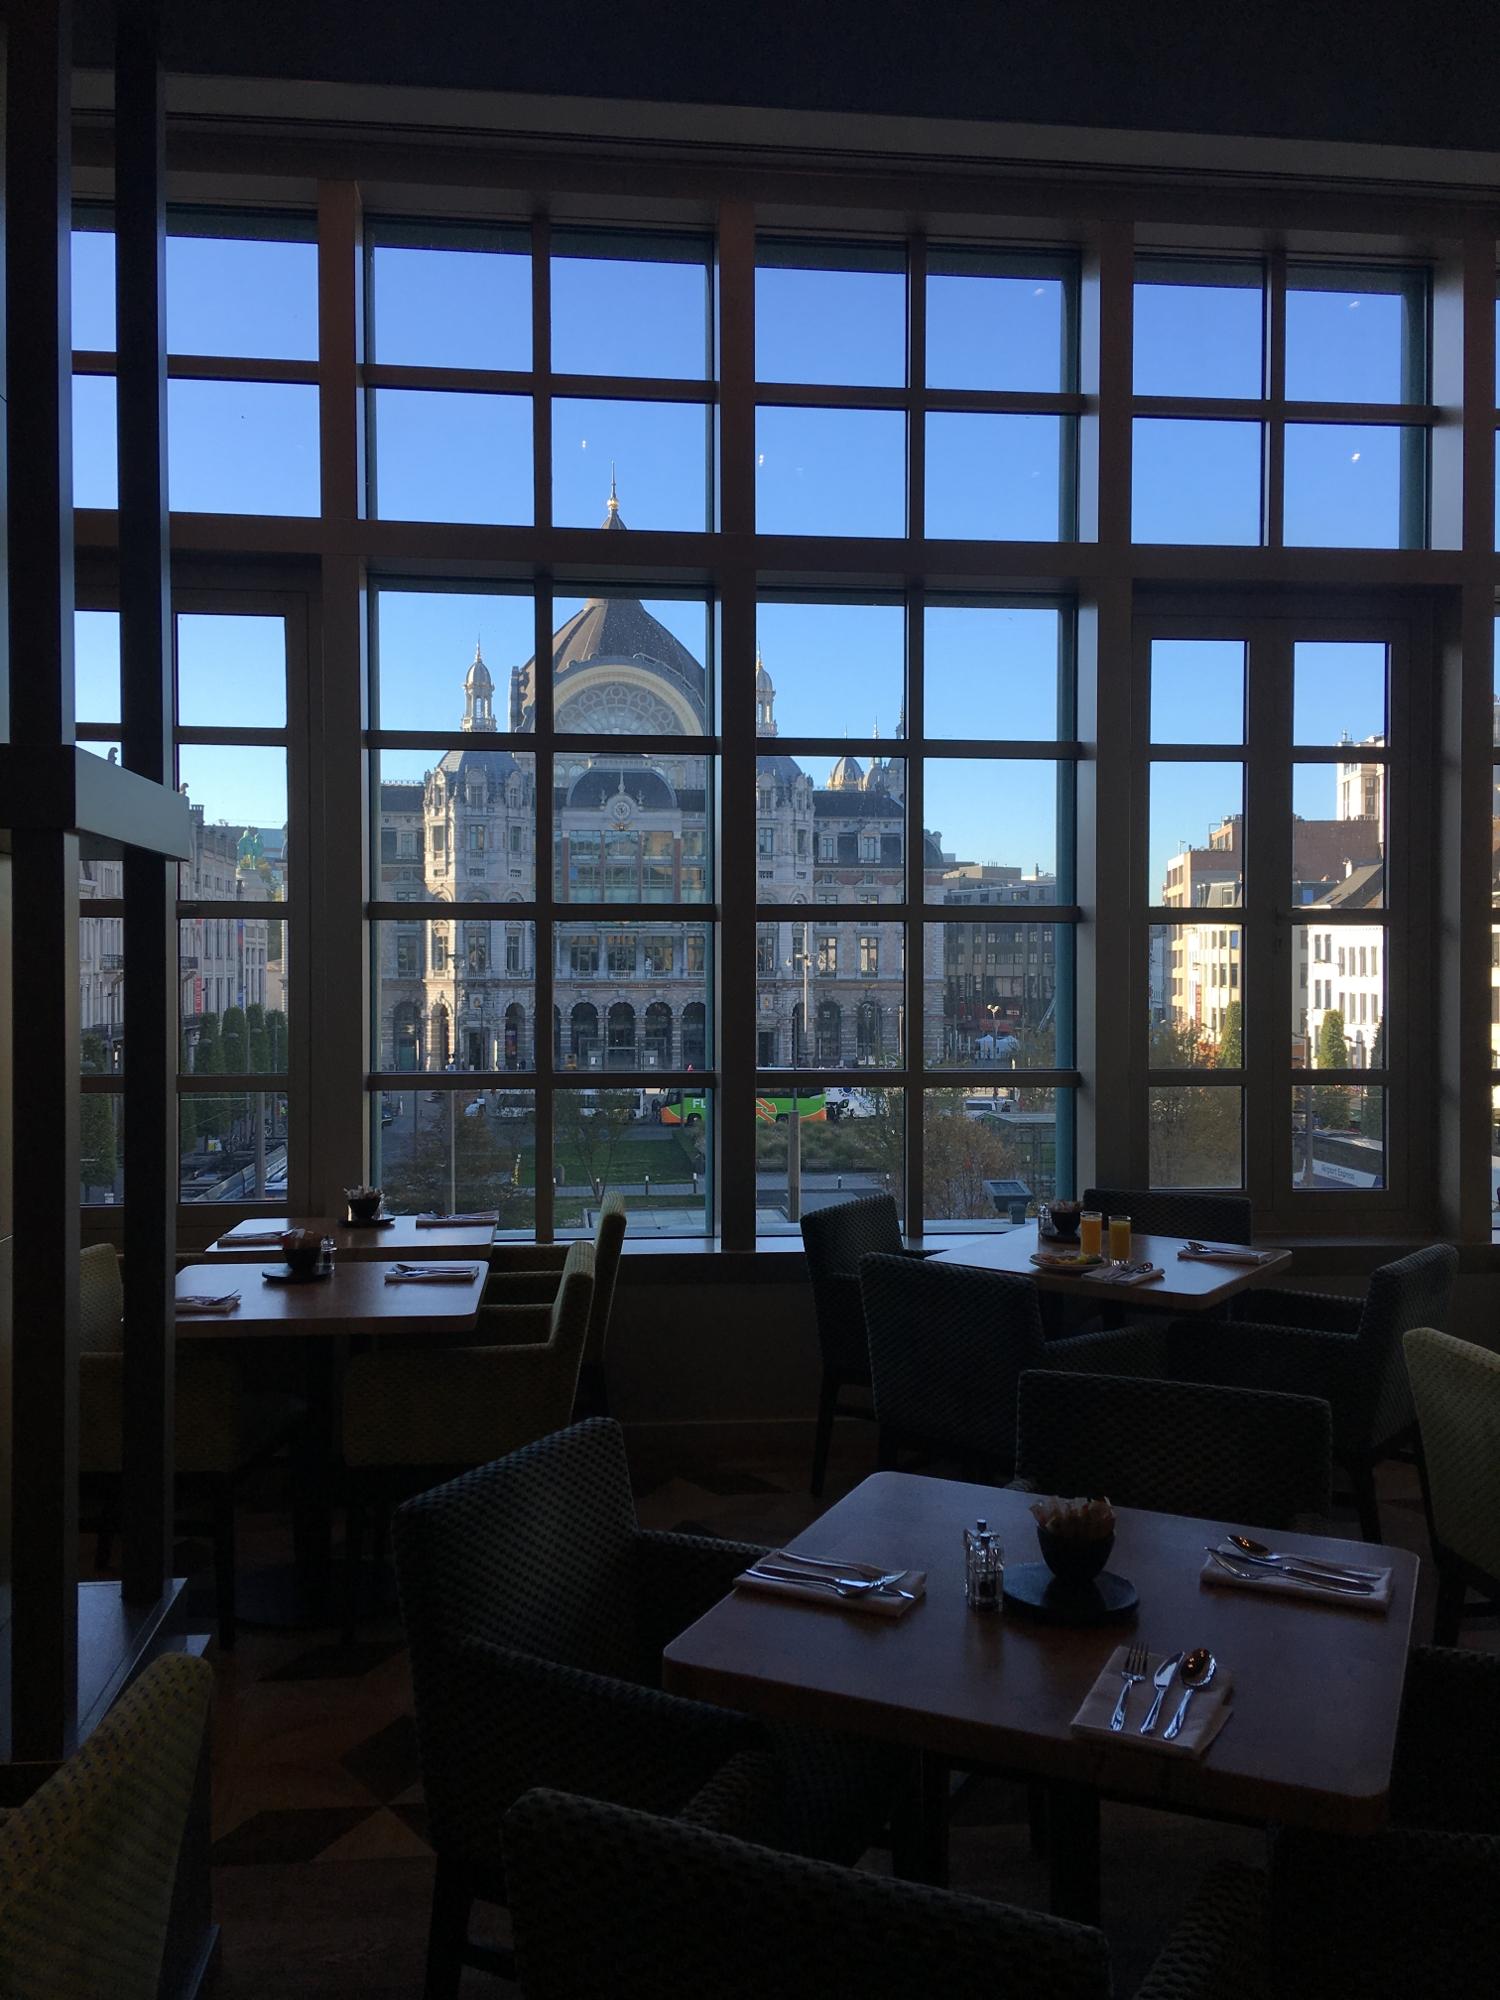 View from Radisson Blu Hotel